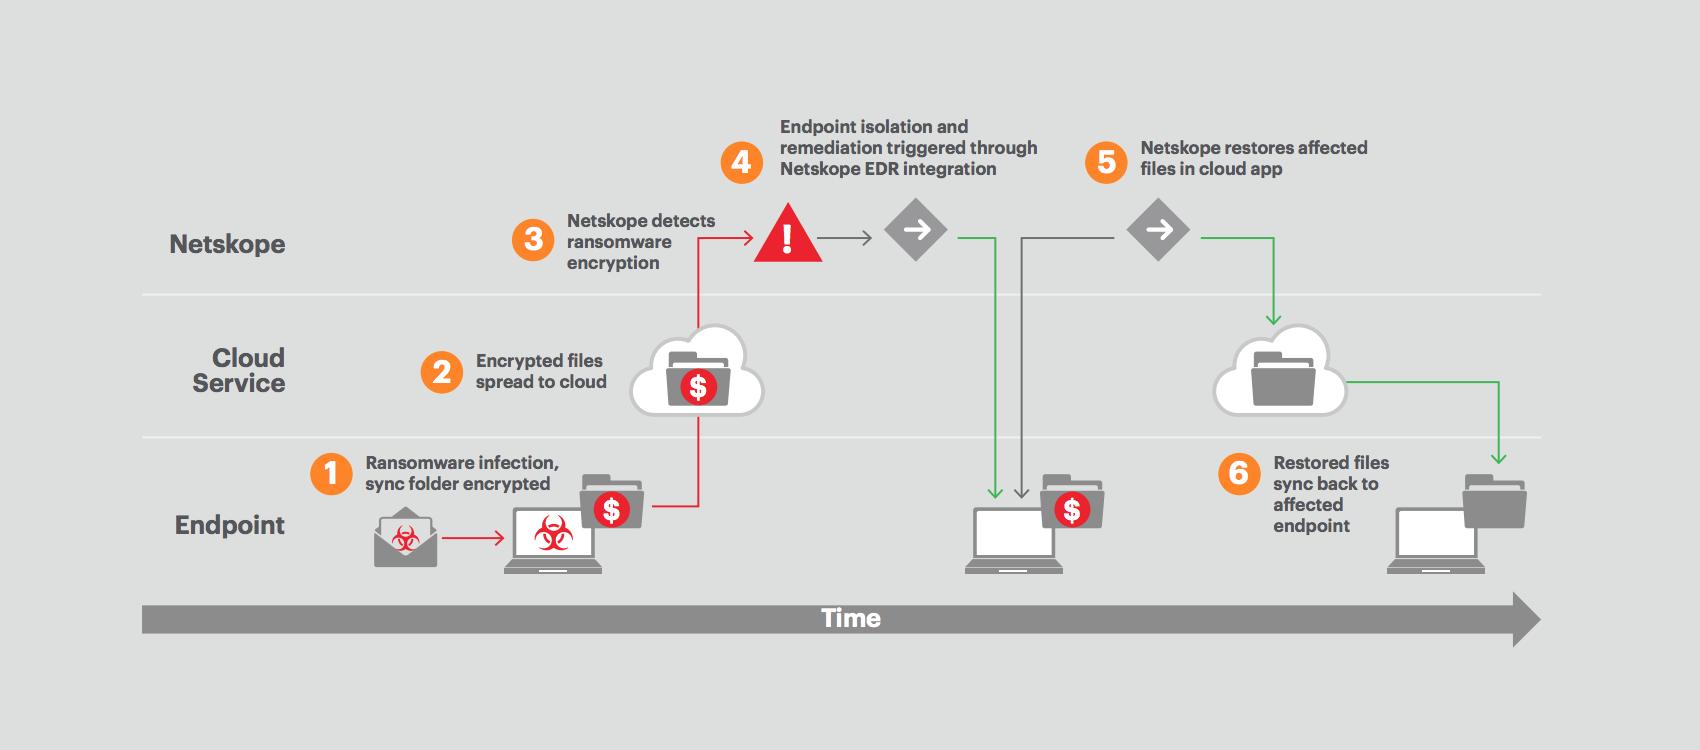 netskope-threat-protection-datasheet-resources-thumb